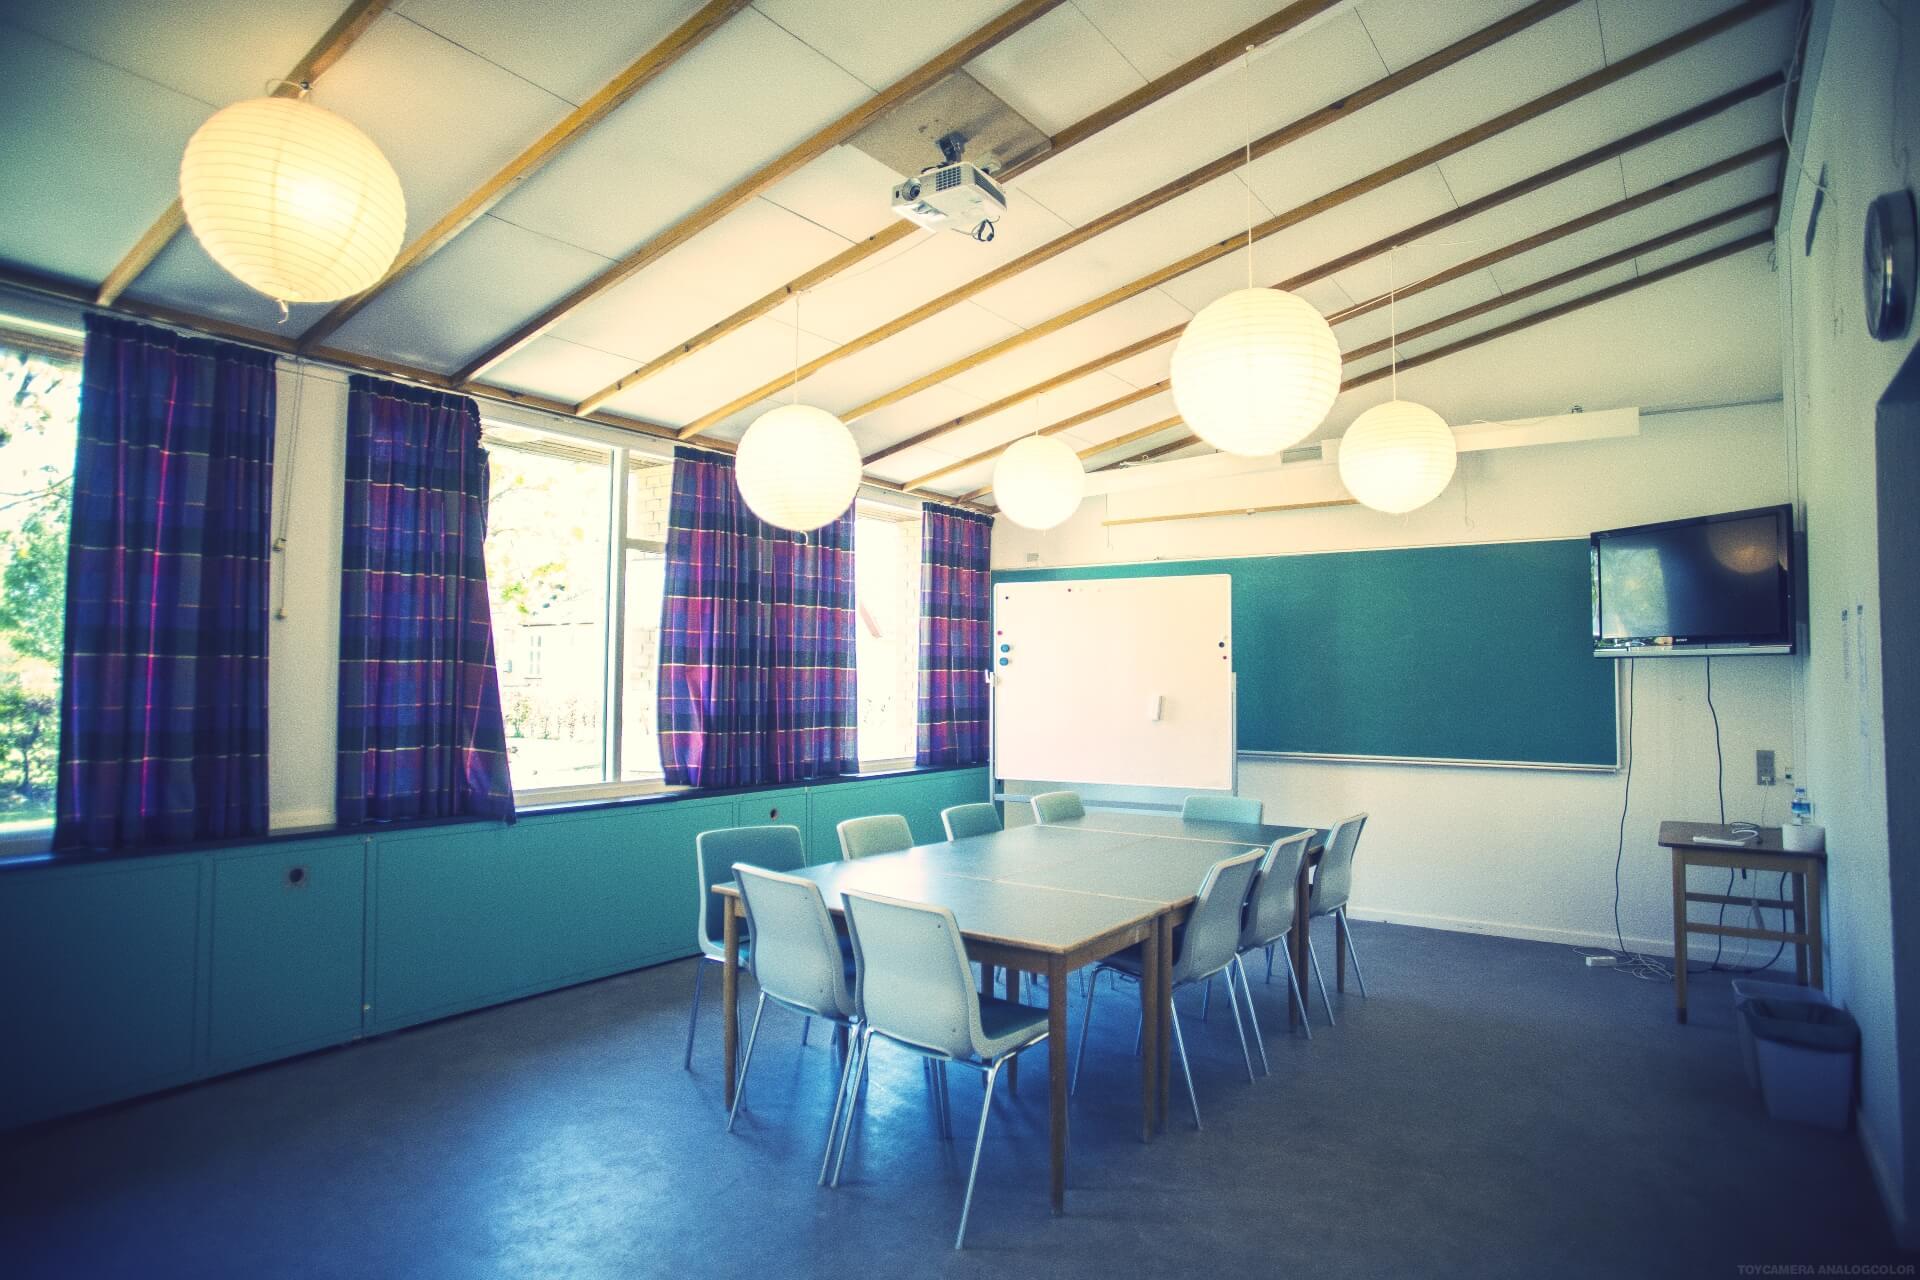 folk high school classroom at Internatioal People's College in Denmark 5